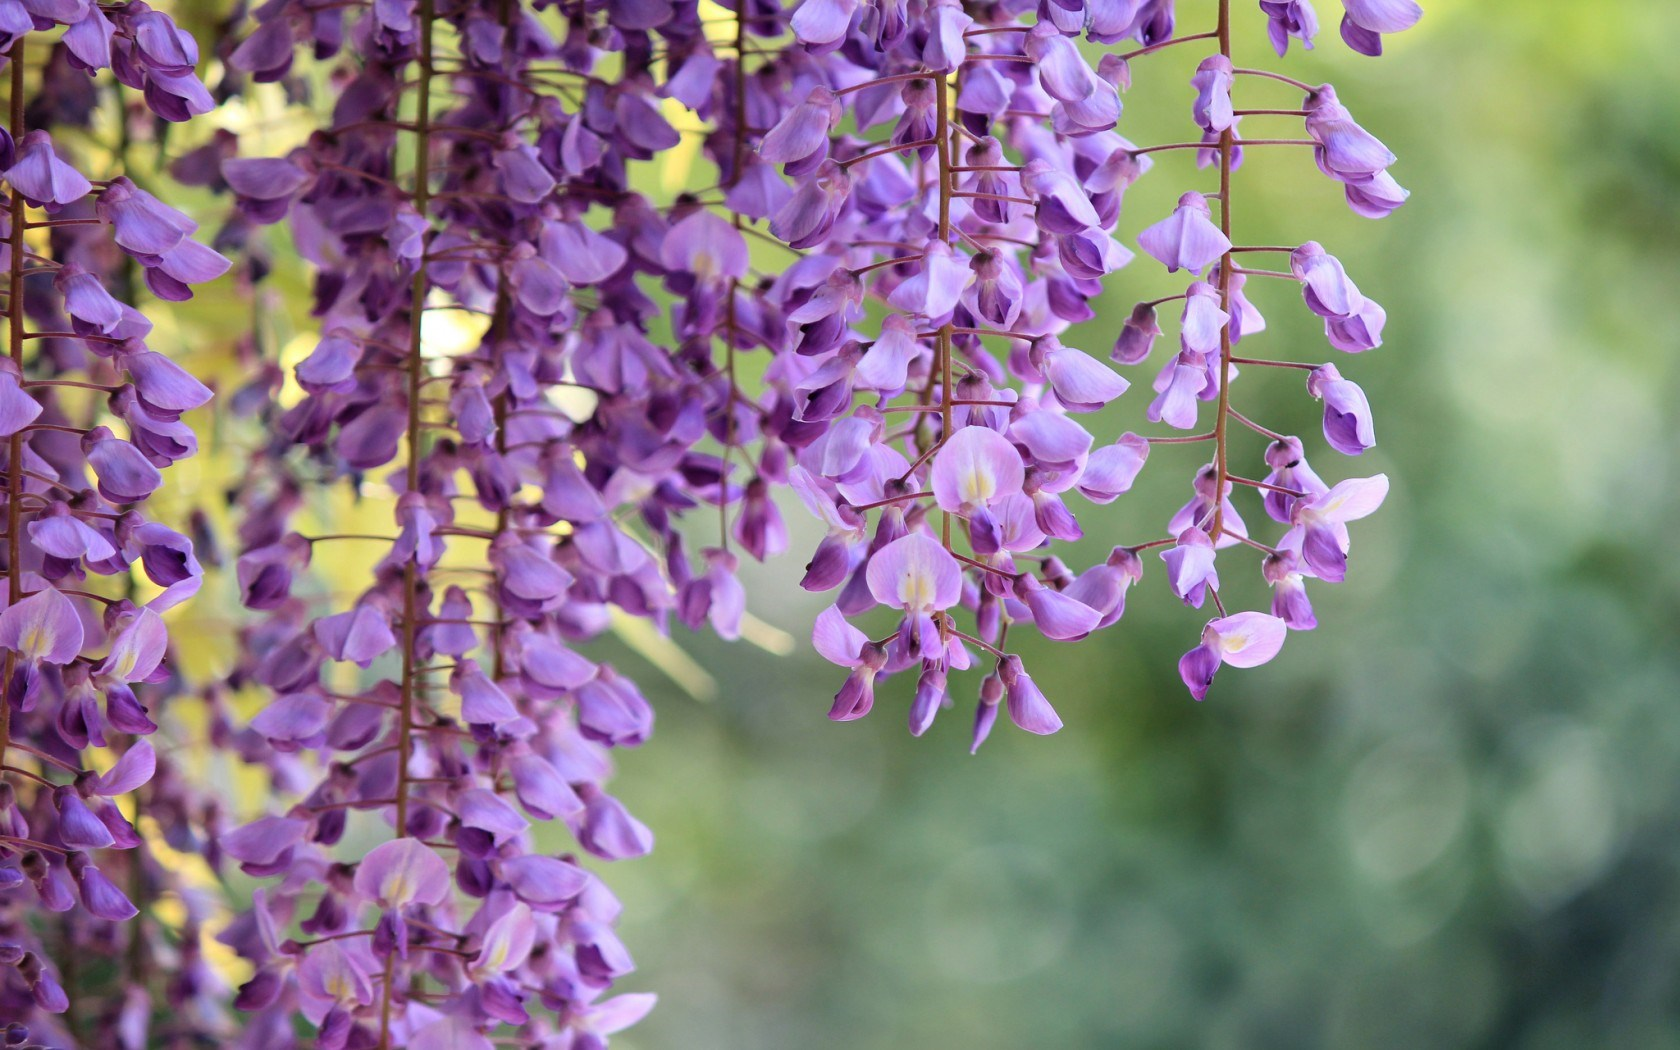 wisteria pictures